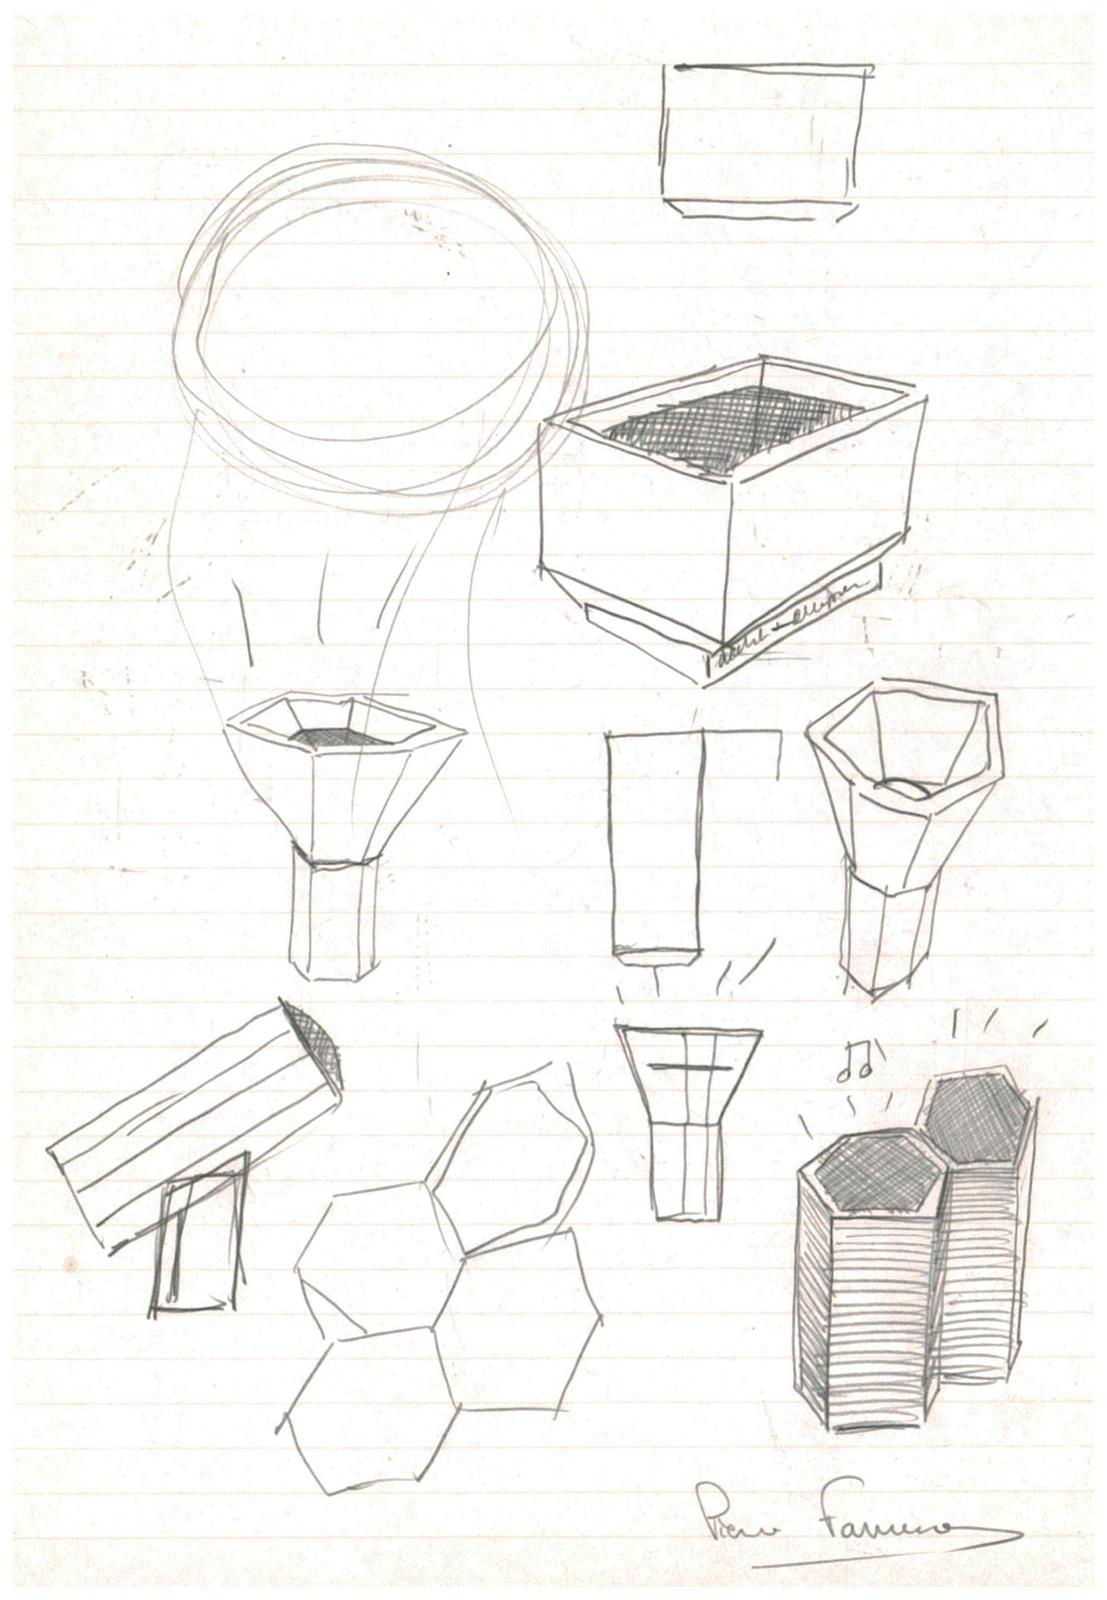 Pierre Favresse - Drawing - Work - Designer - Design - Preparatory sketch n°8